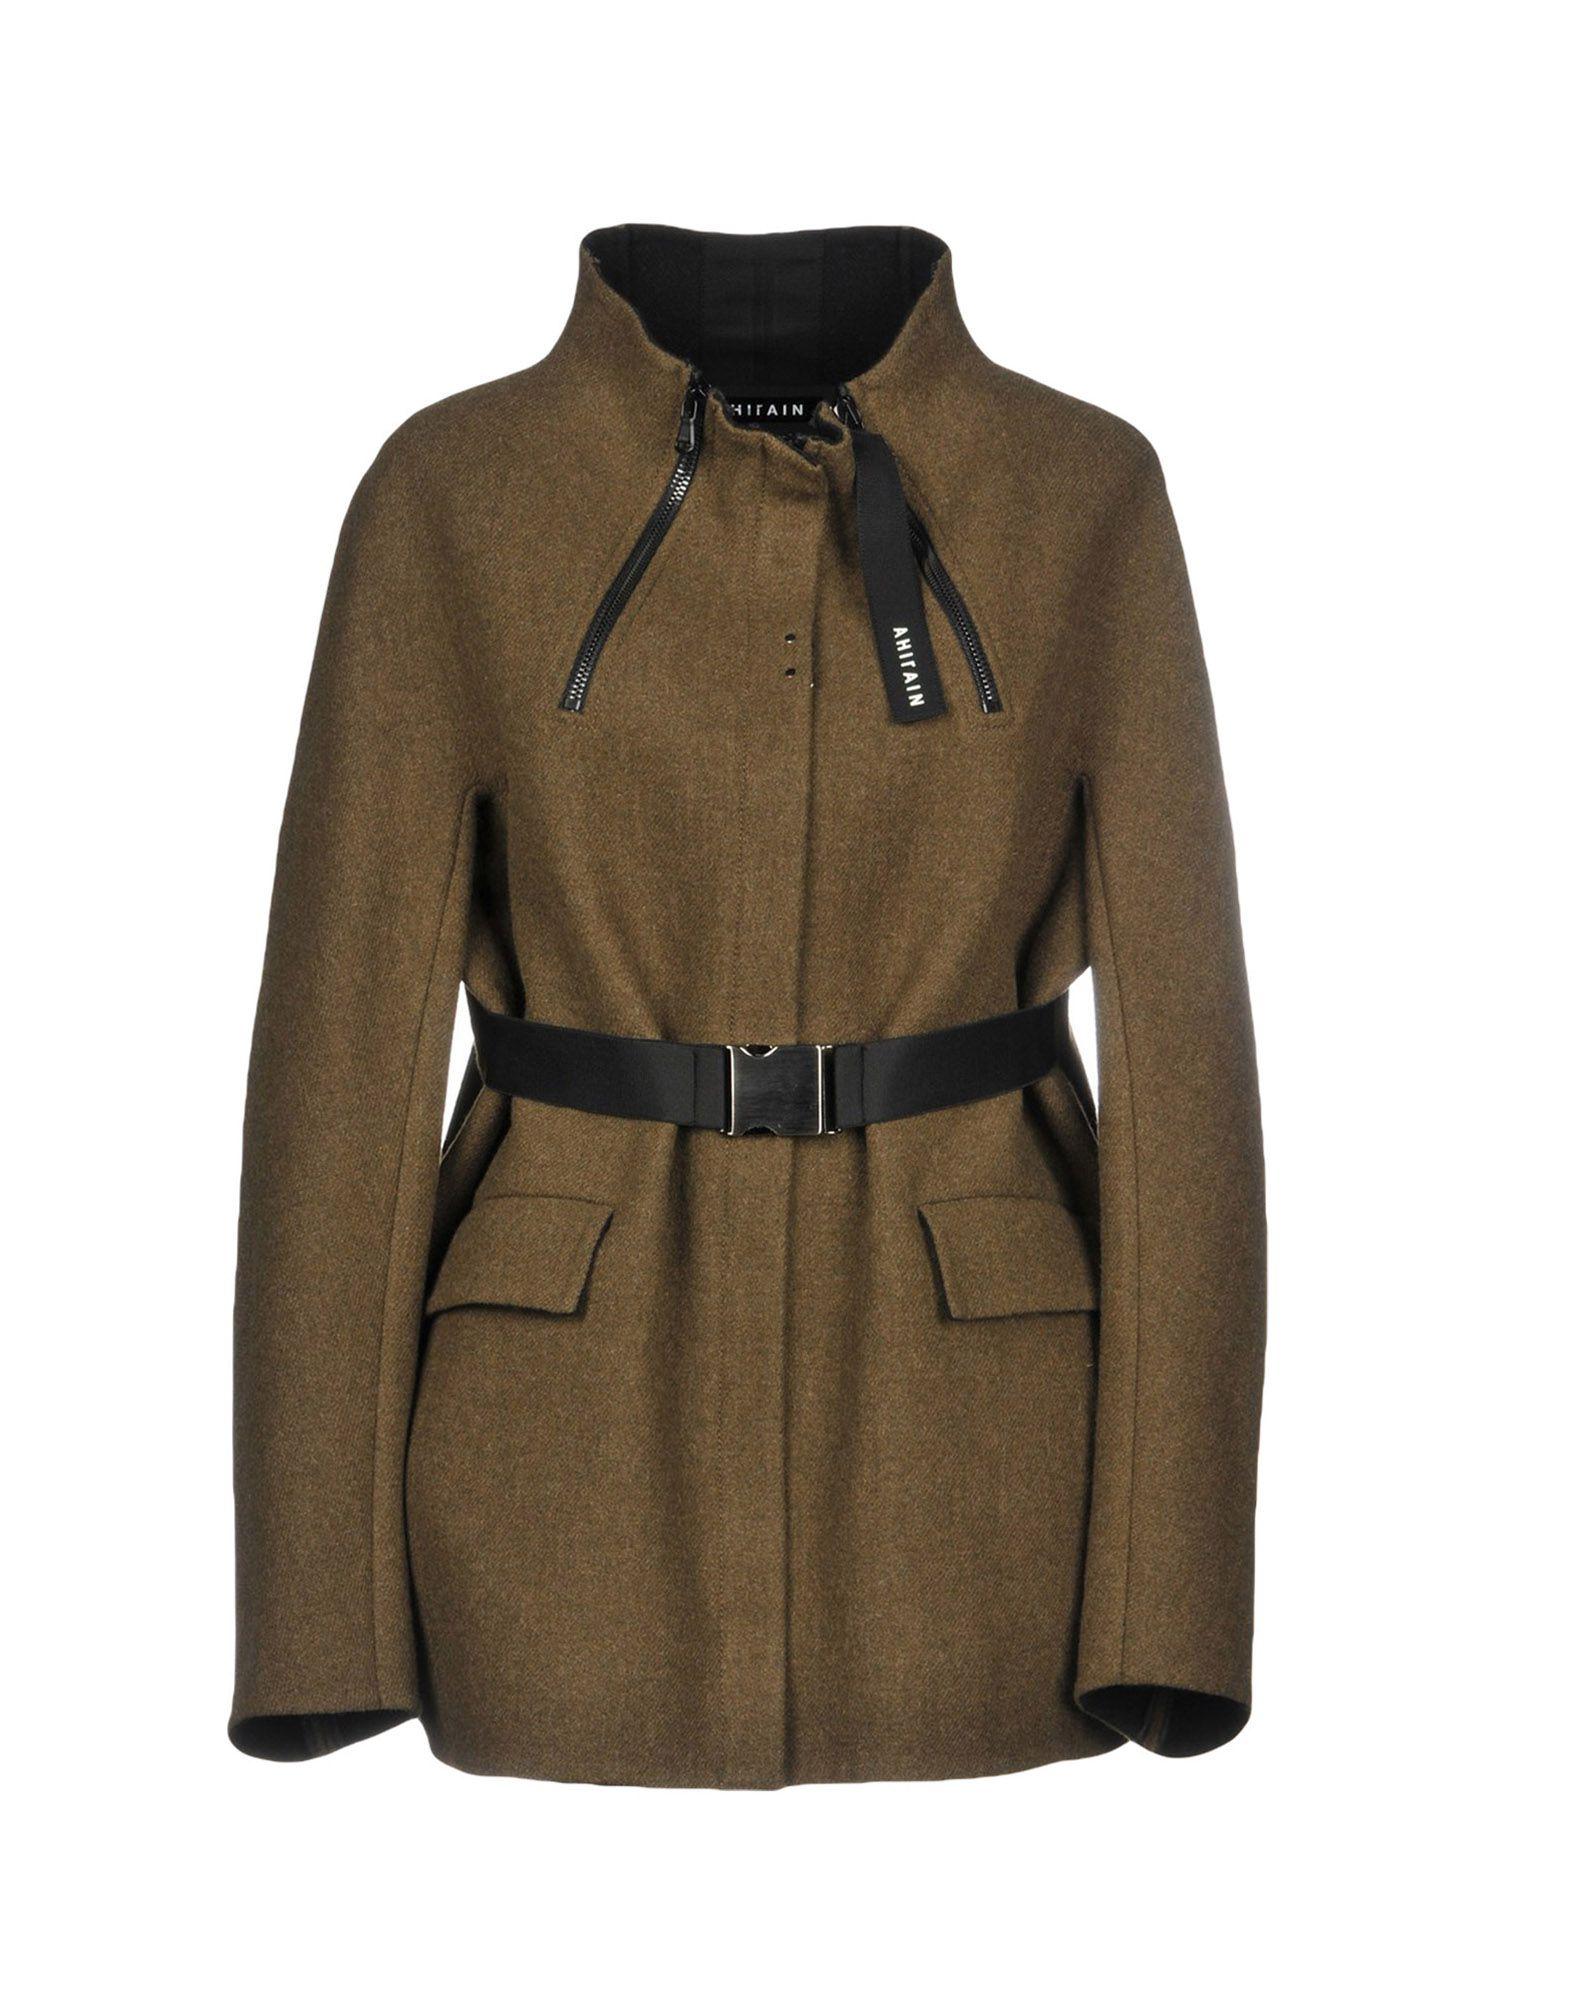 AHIRAIN Coat in Military Green